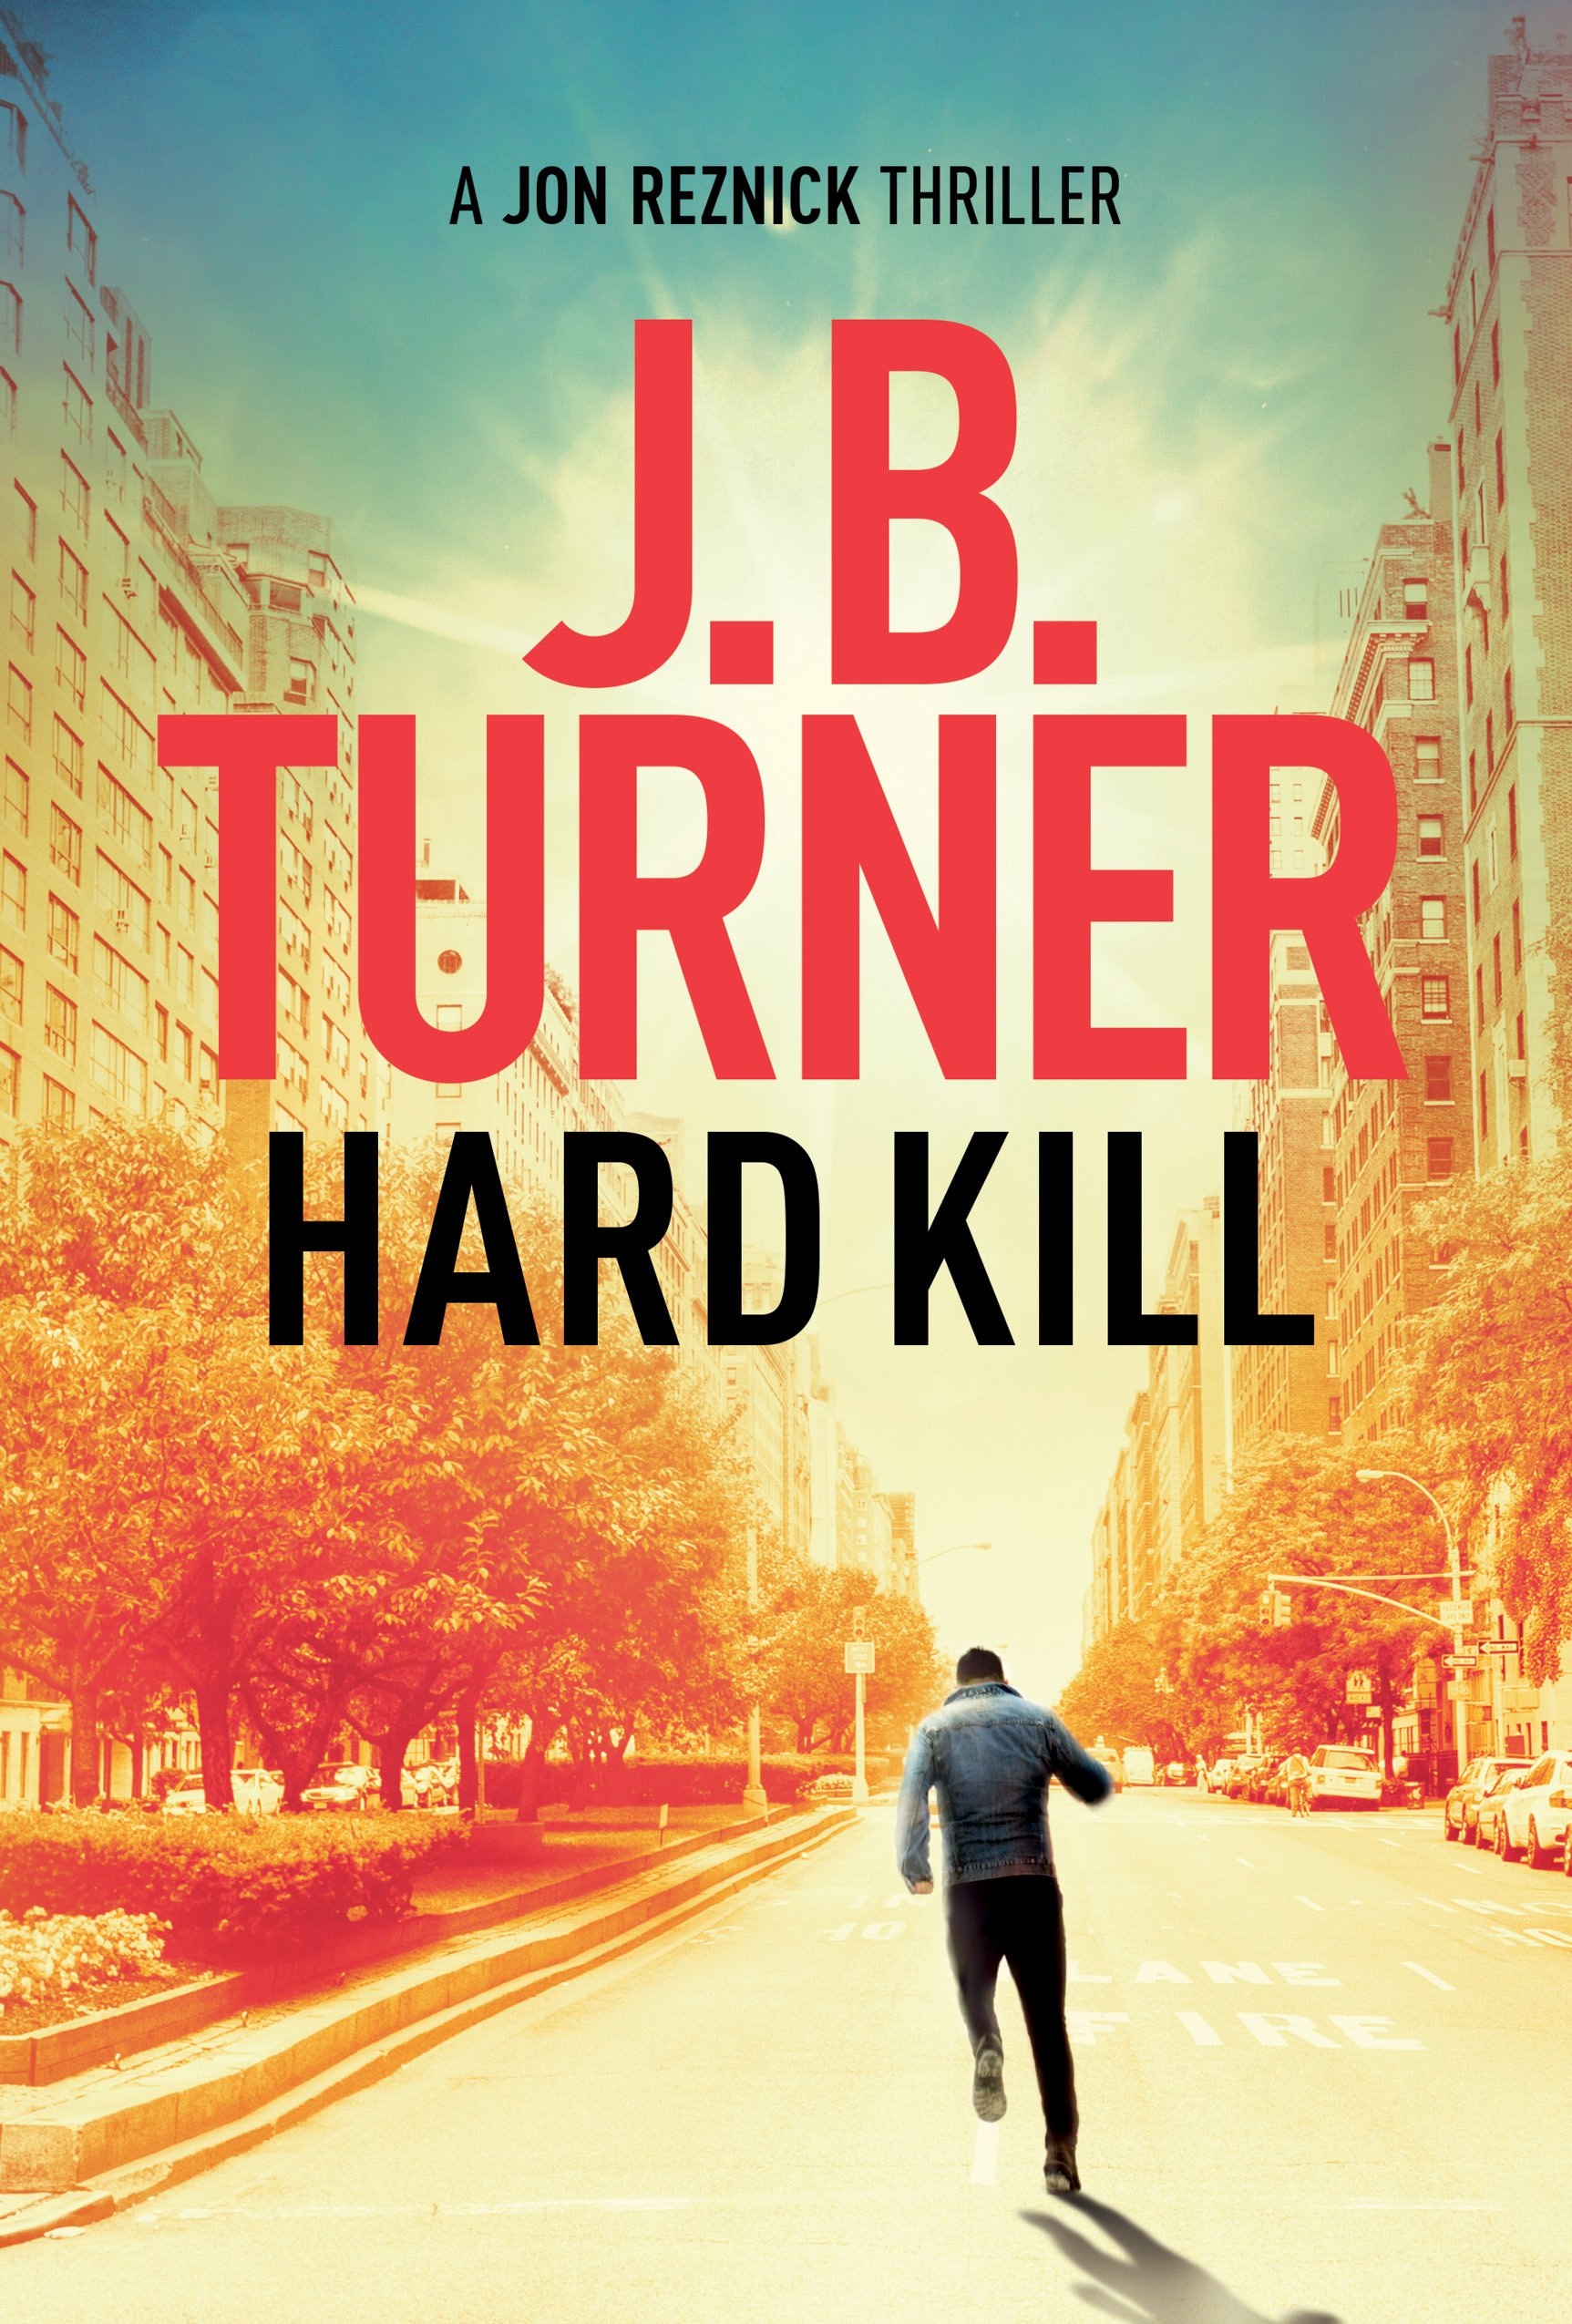 Hard Kill (A Jon Reznick Thriller Book 2)